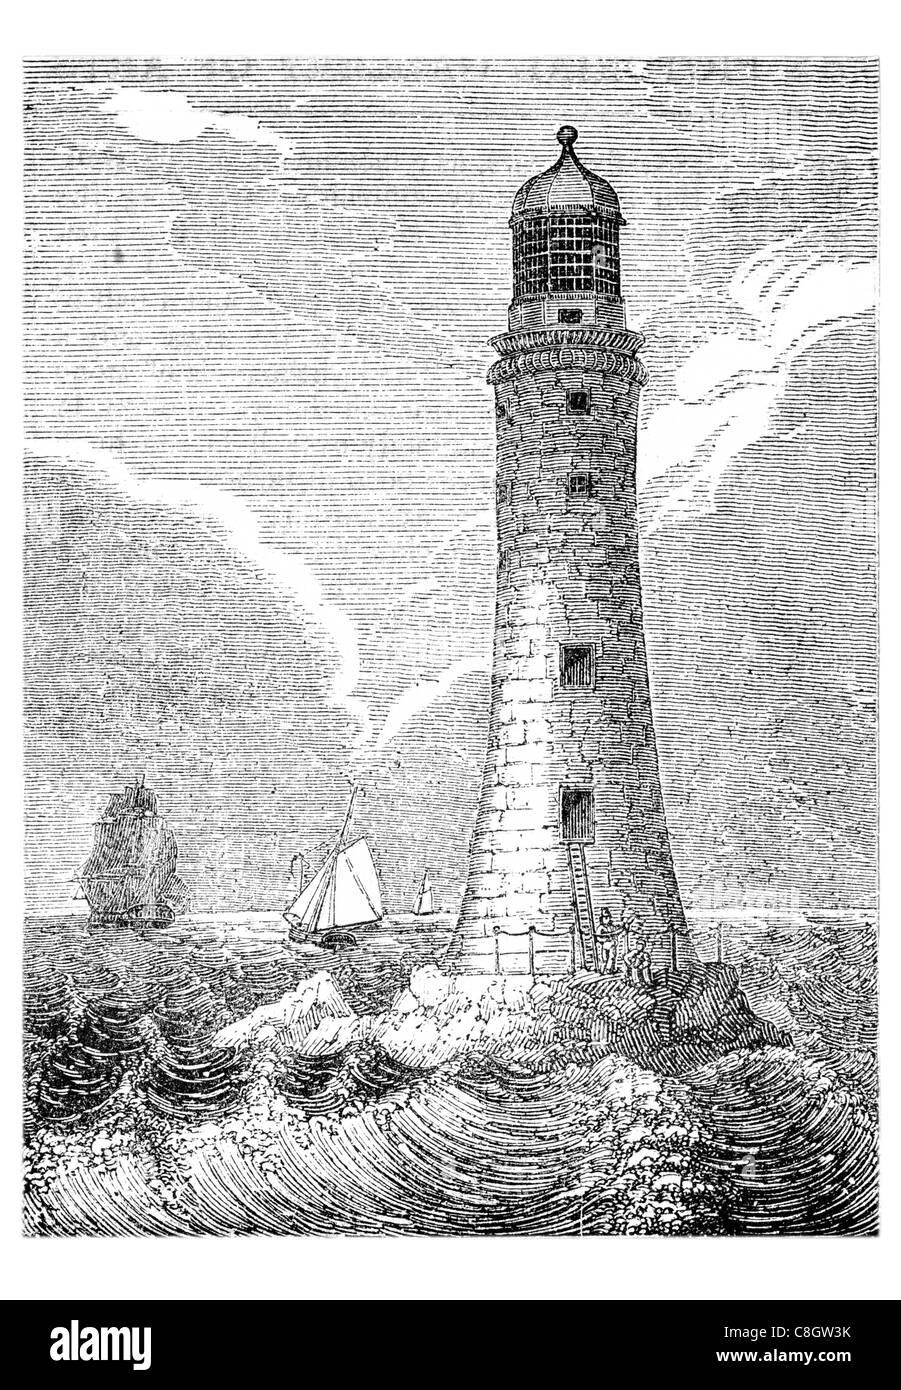 East side Eddystone Lighthouse Rocks Rame Head United Kingdom Devon Precambrian Gneiss concrete s - Stock Image